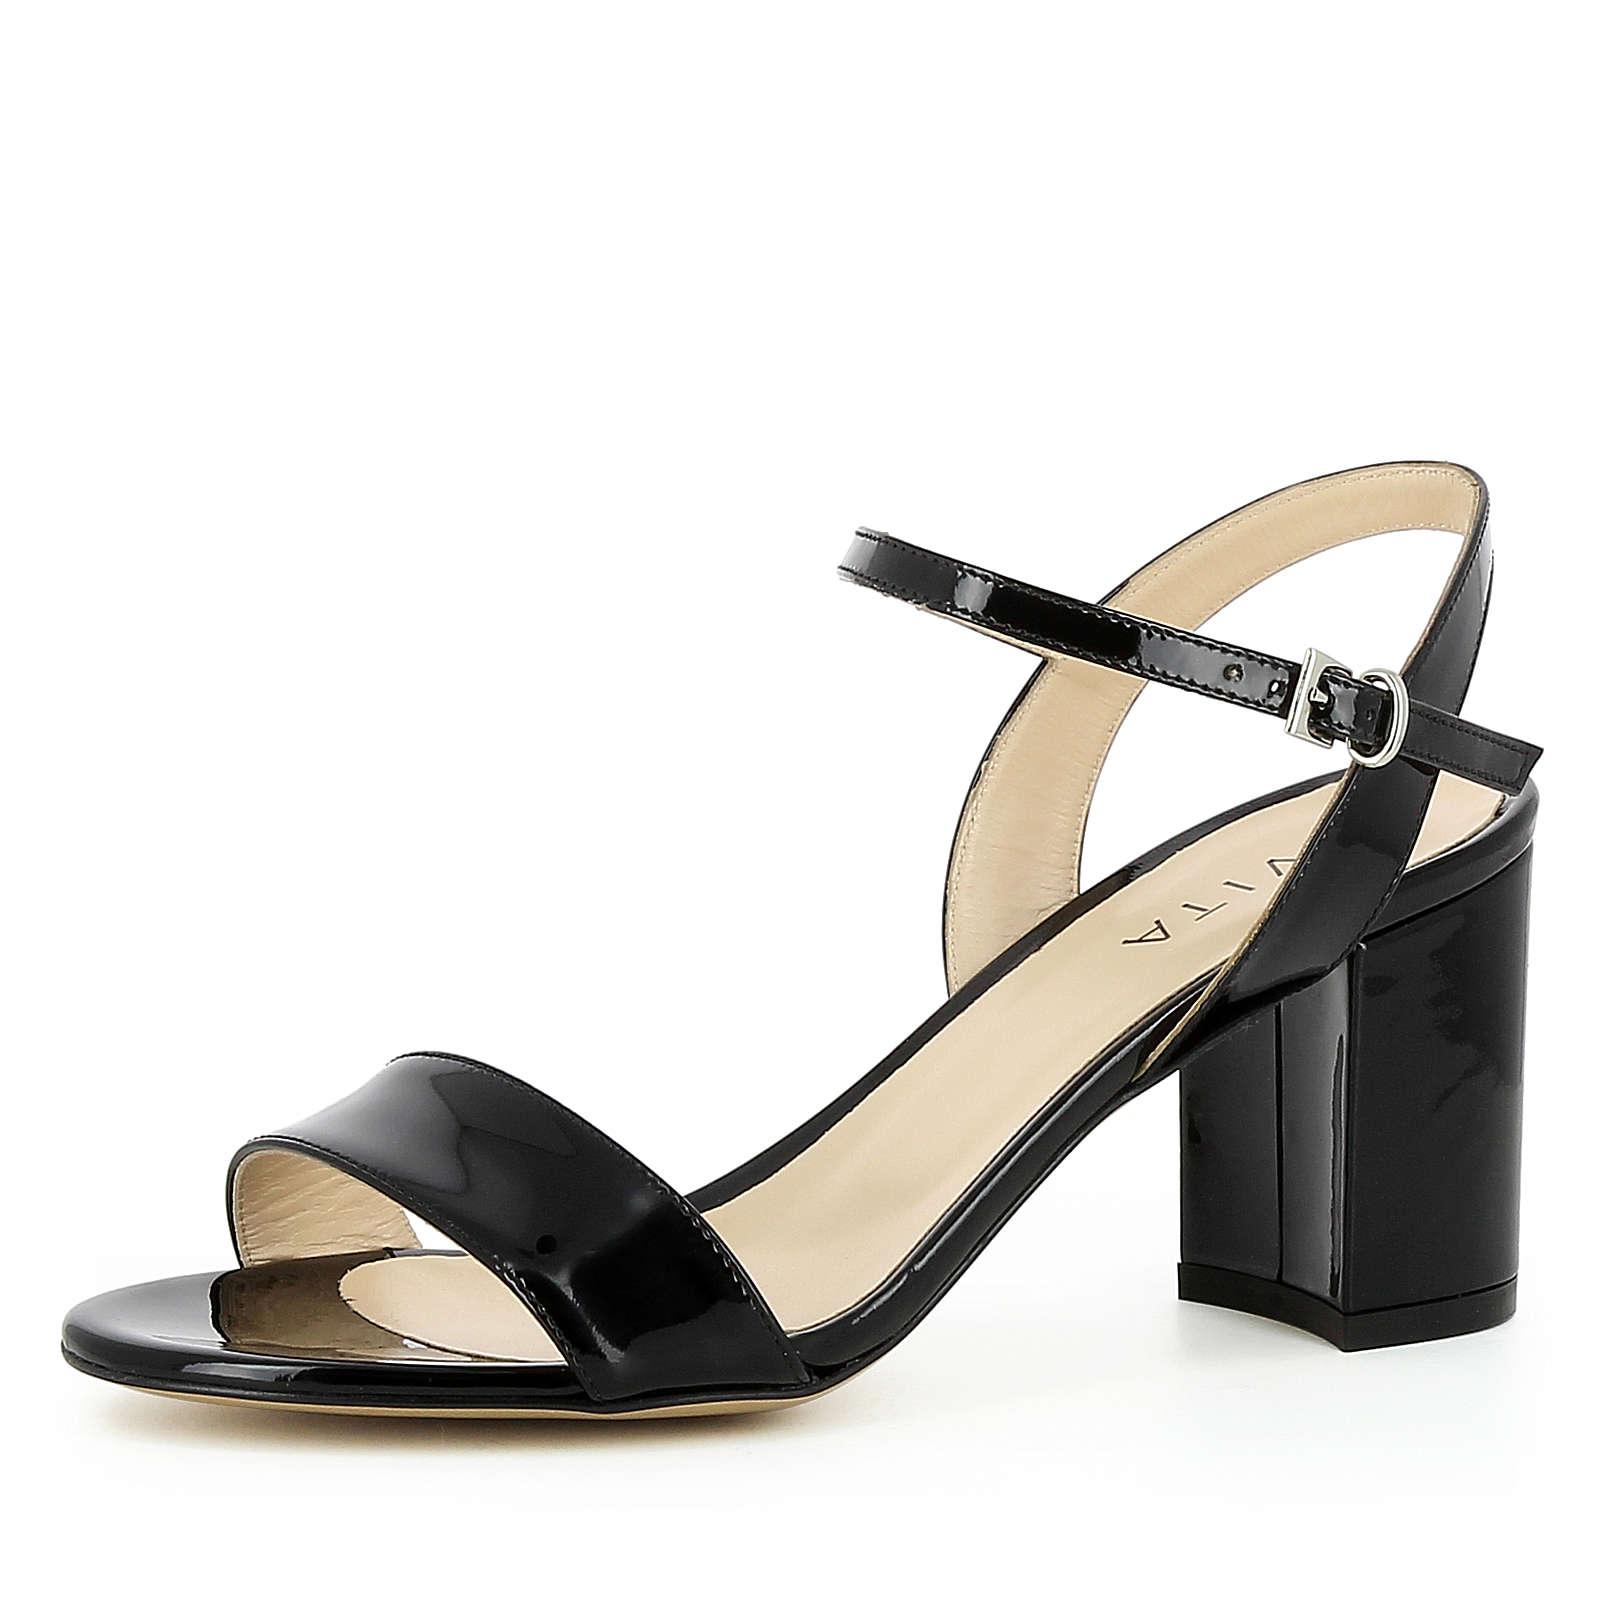 Evita Shoes Damen Sandalette AMBRA Klassische Sandaletten schwarz Damen Gr. 37